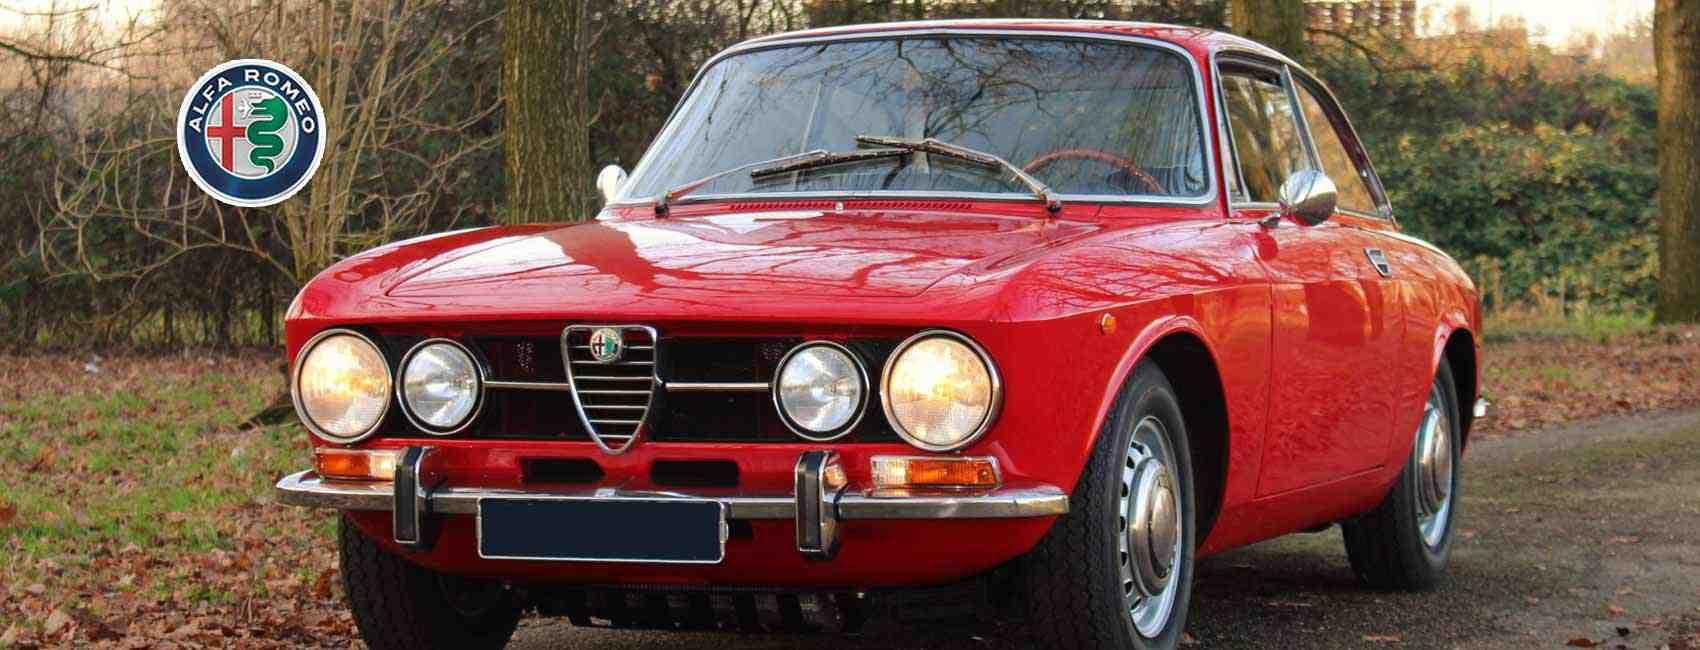 Alfa Romeo Used Parts Quality Auto Parts Buy Quality Parts For A - Alfa romeo car parts